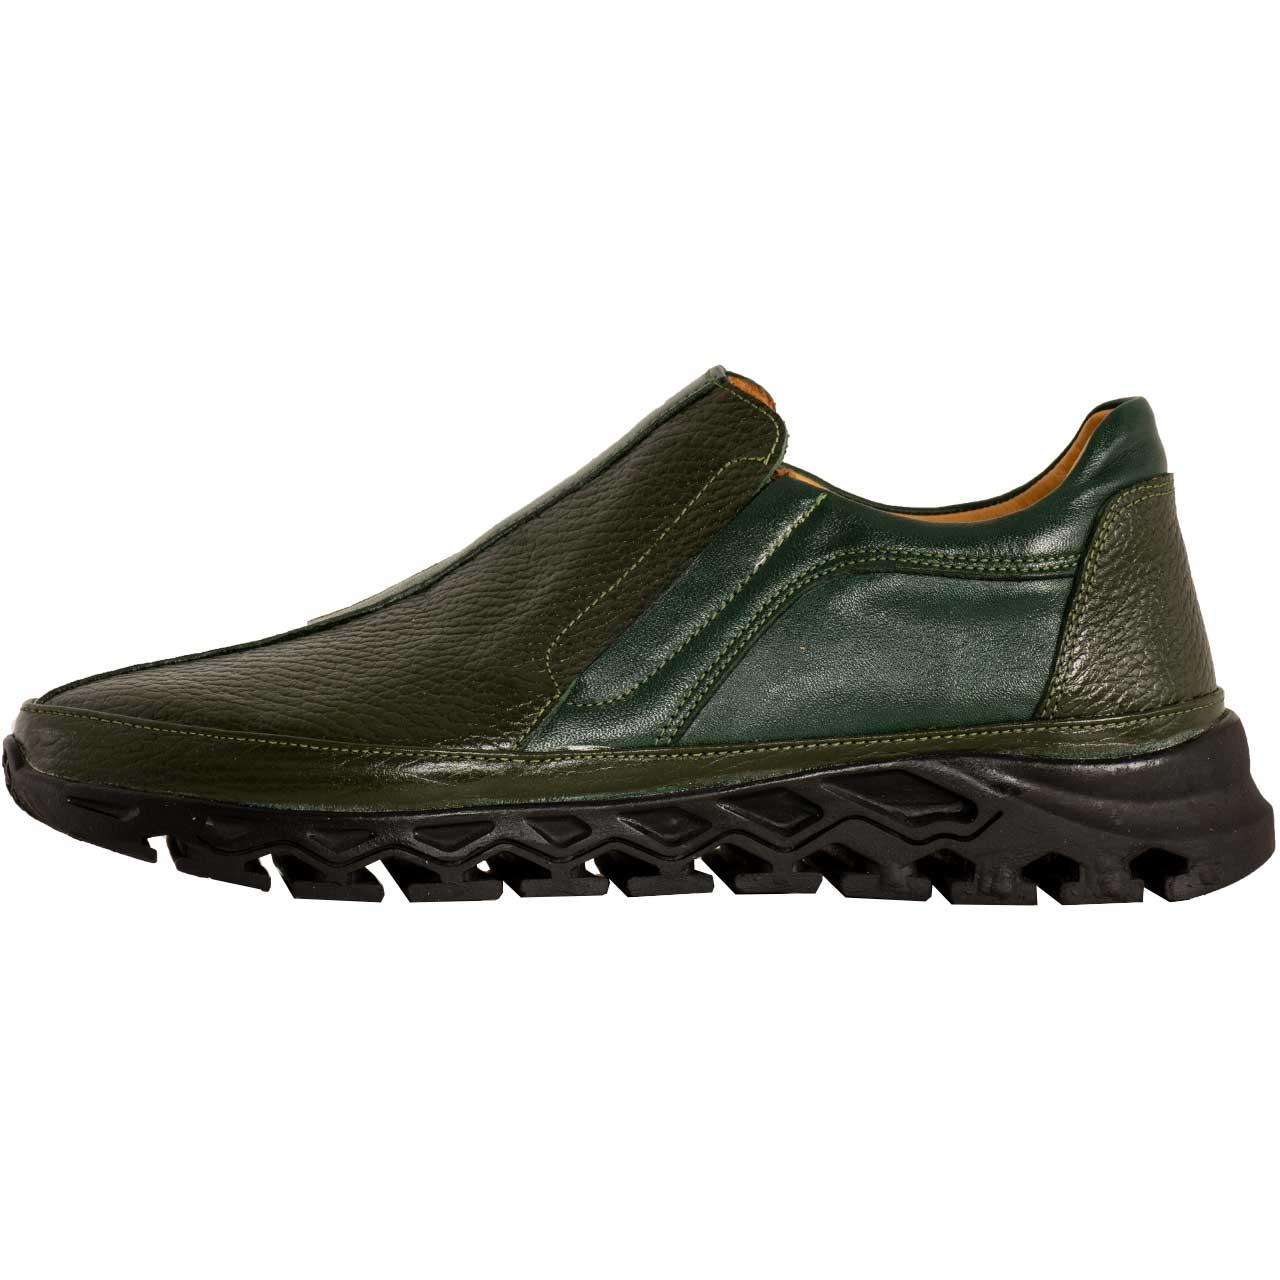 کفش روزمره زنانه پارینه چرم مدل SHOW42-9